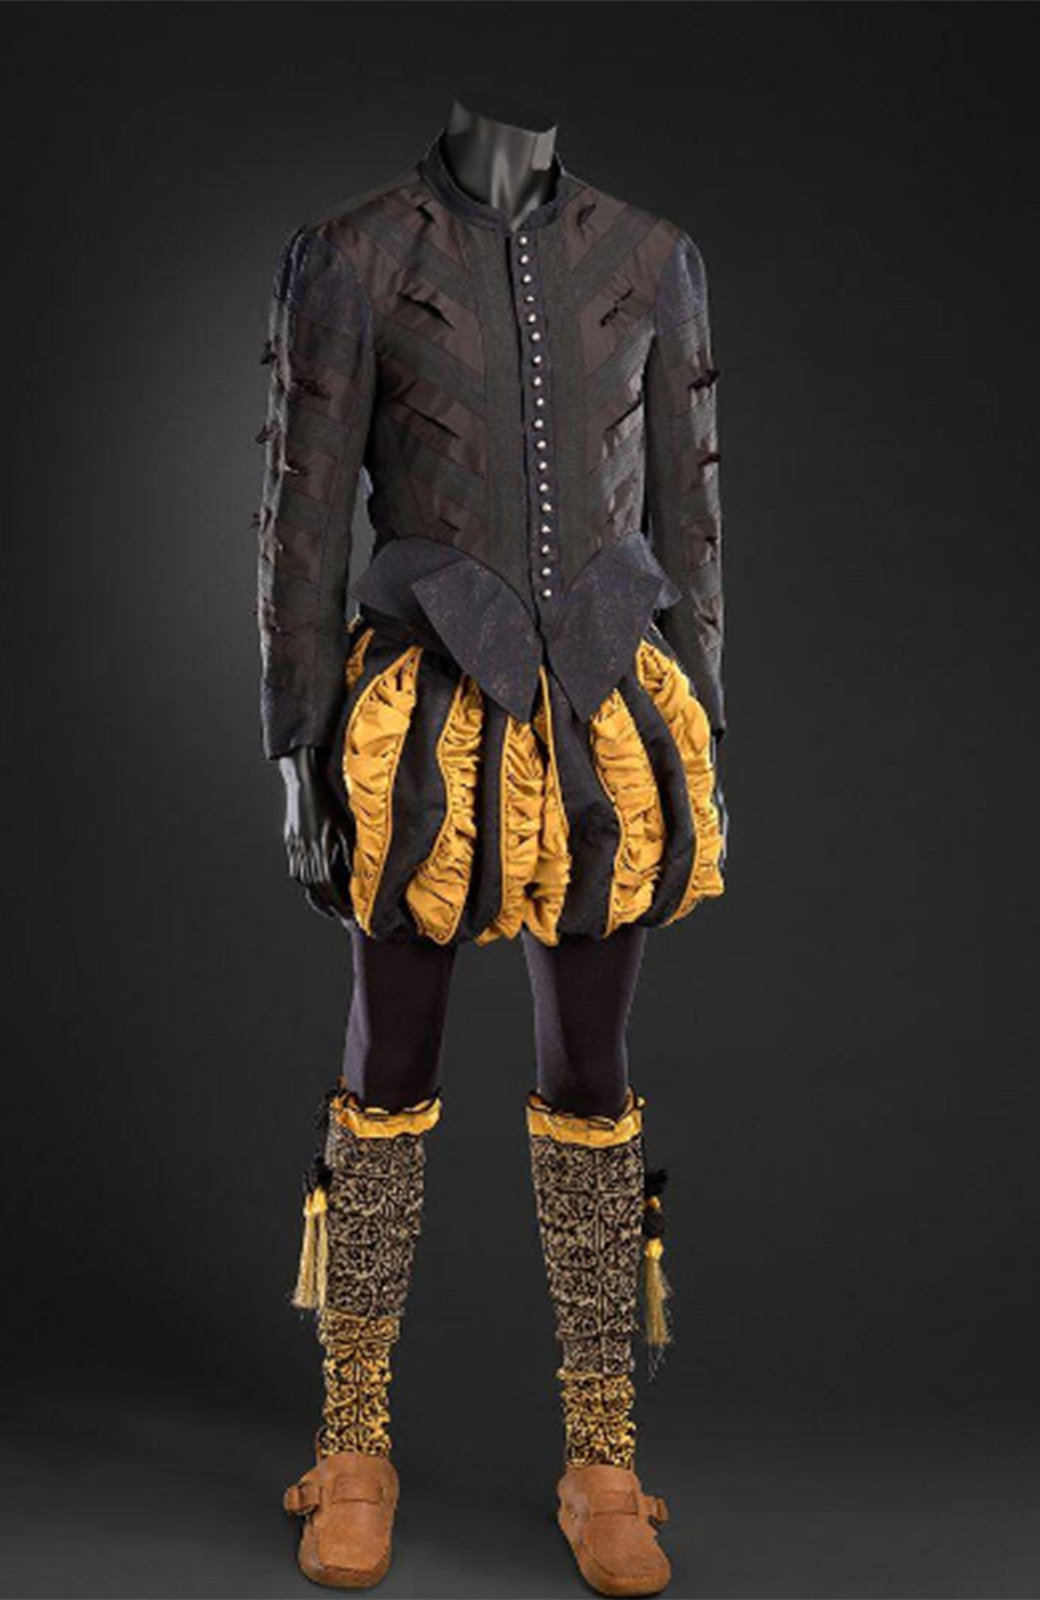 Copyright Clothing Design | Fashion Reinterpretations Part 1 Exhibitions Europeana Collections